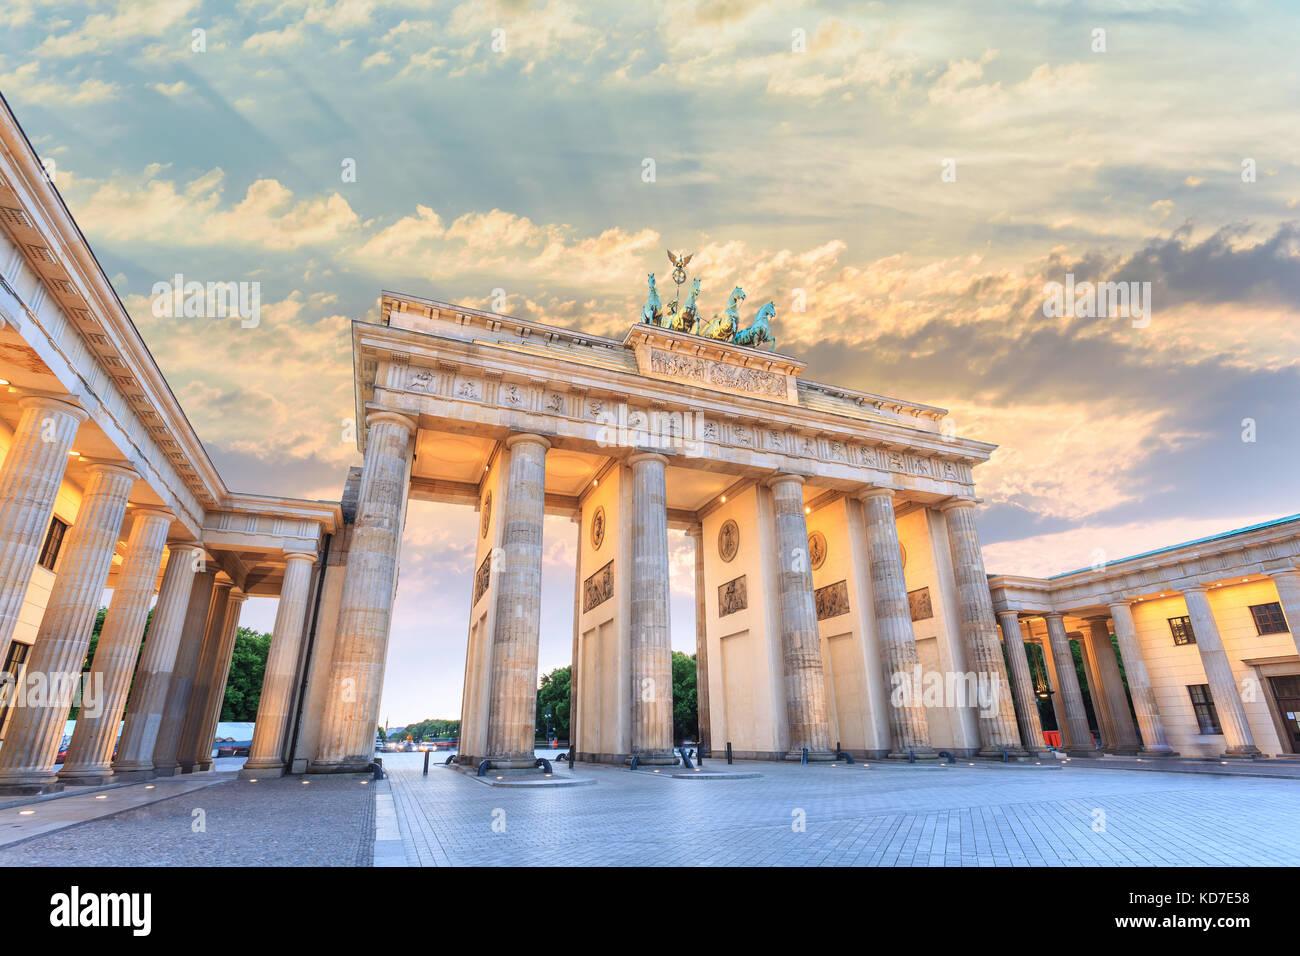 Berlin Sonnenuntergang Skyline der Stadt am Brandenburger Tor (Brandenburger Tor), Berlin, Deutschland Stockbild